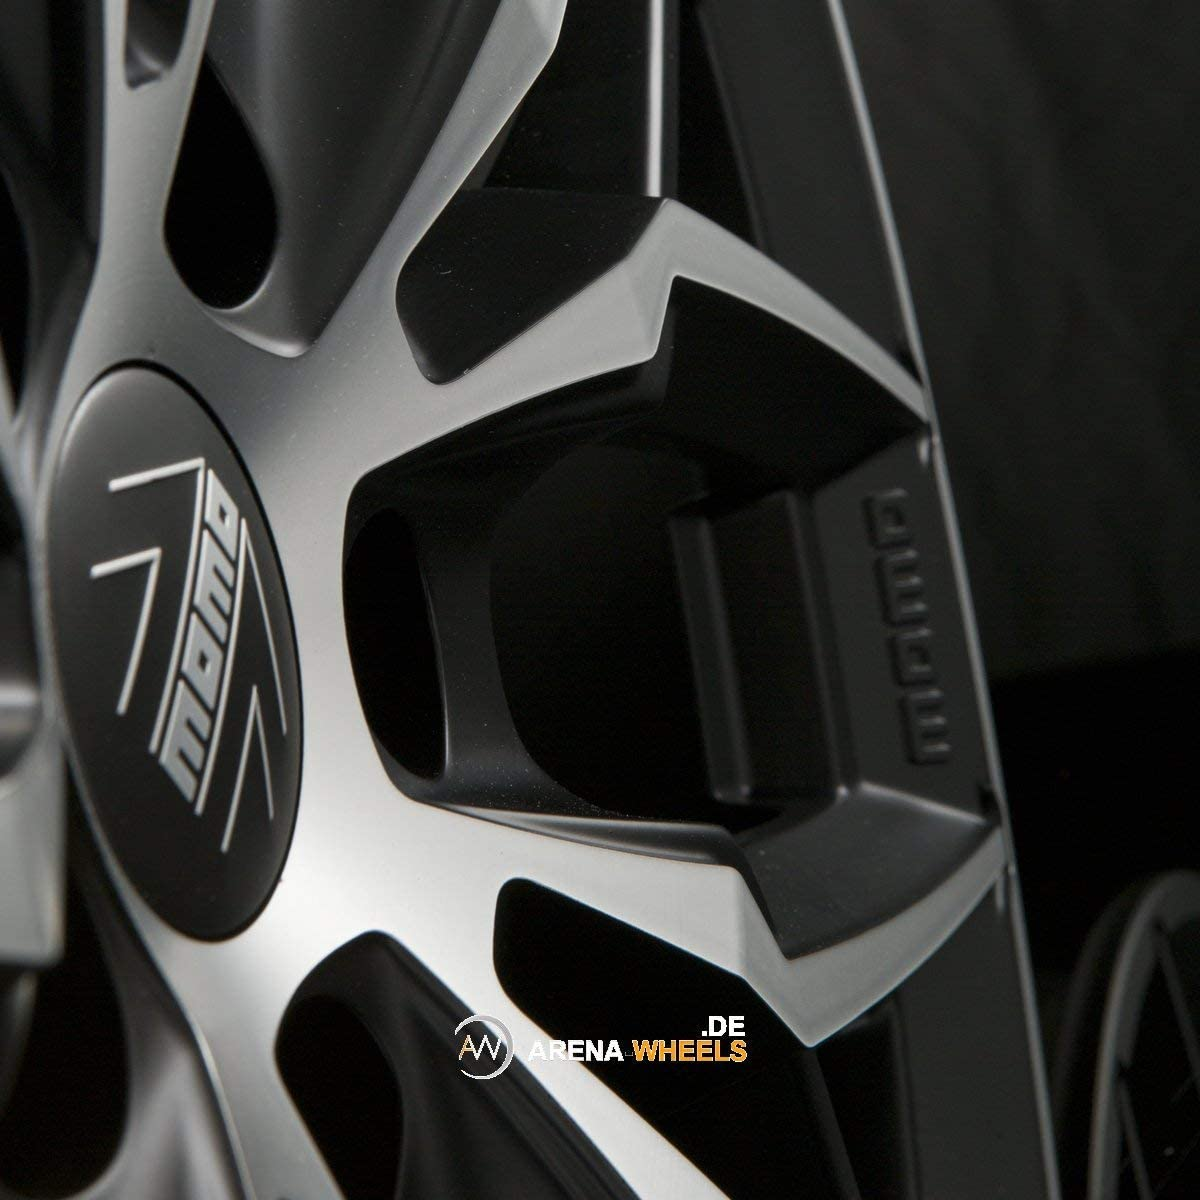 9.5 x 19 ET45 5 x 112 Alloy Wheels MOMO WSPB9594512S Car